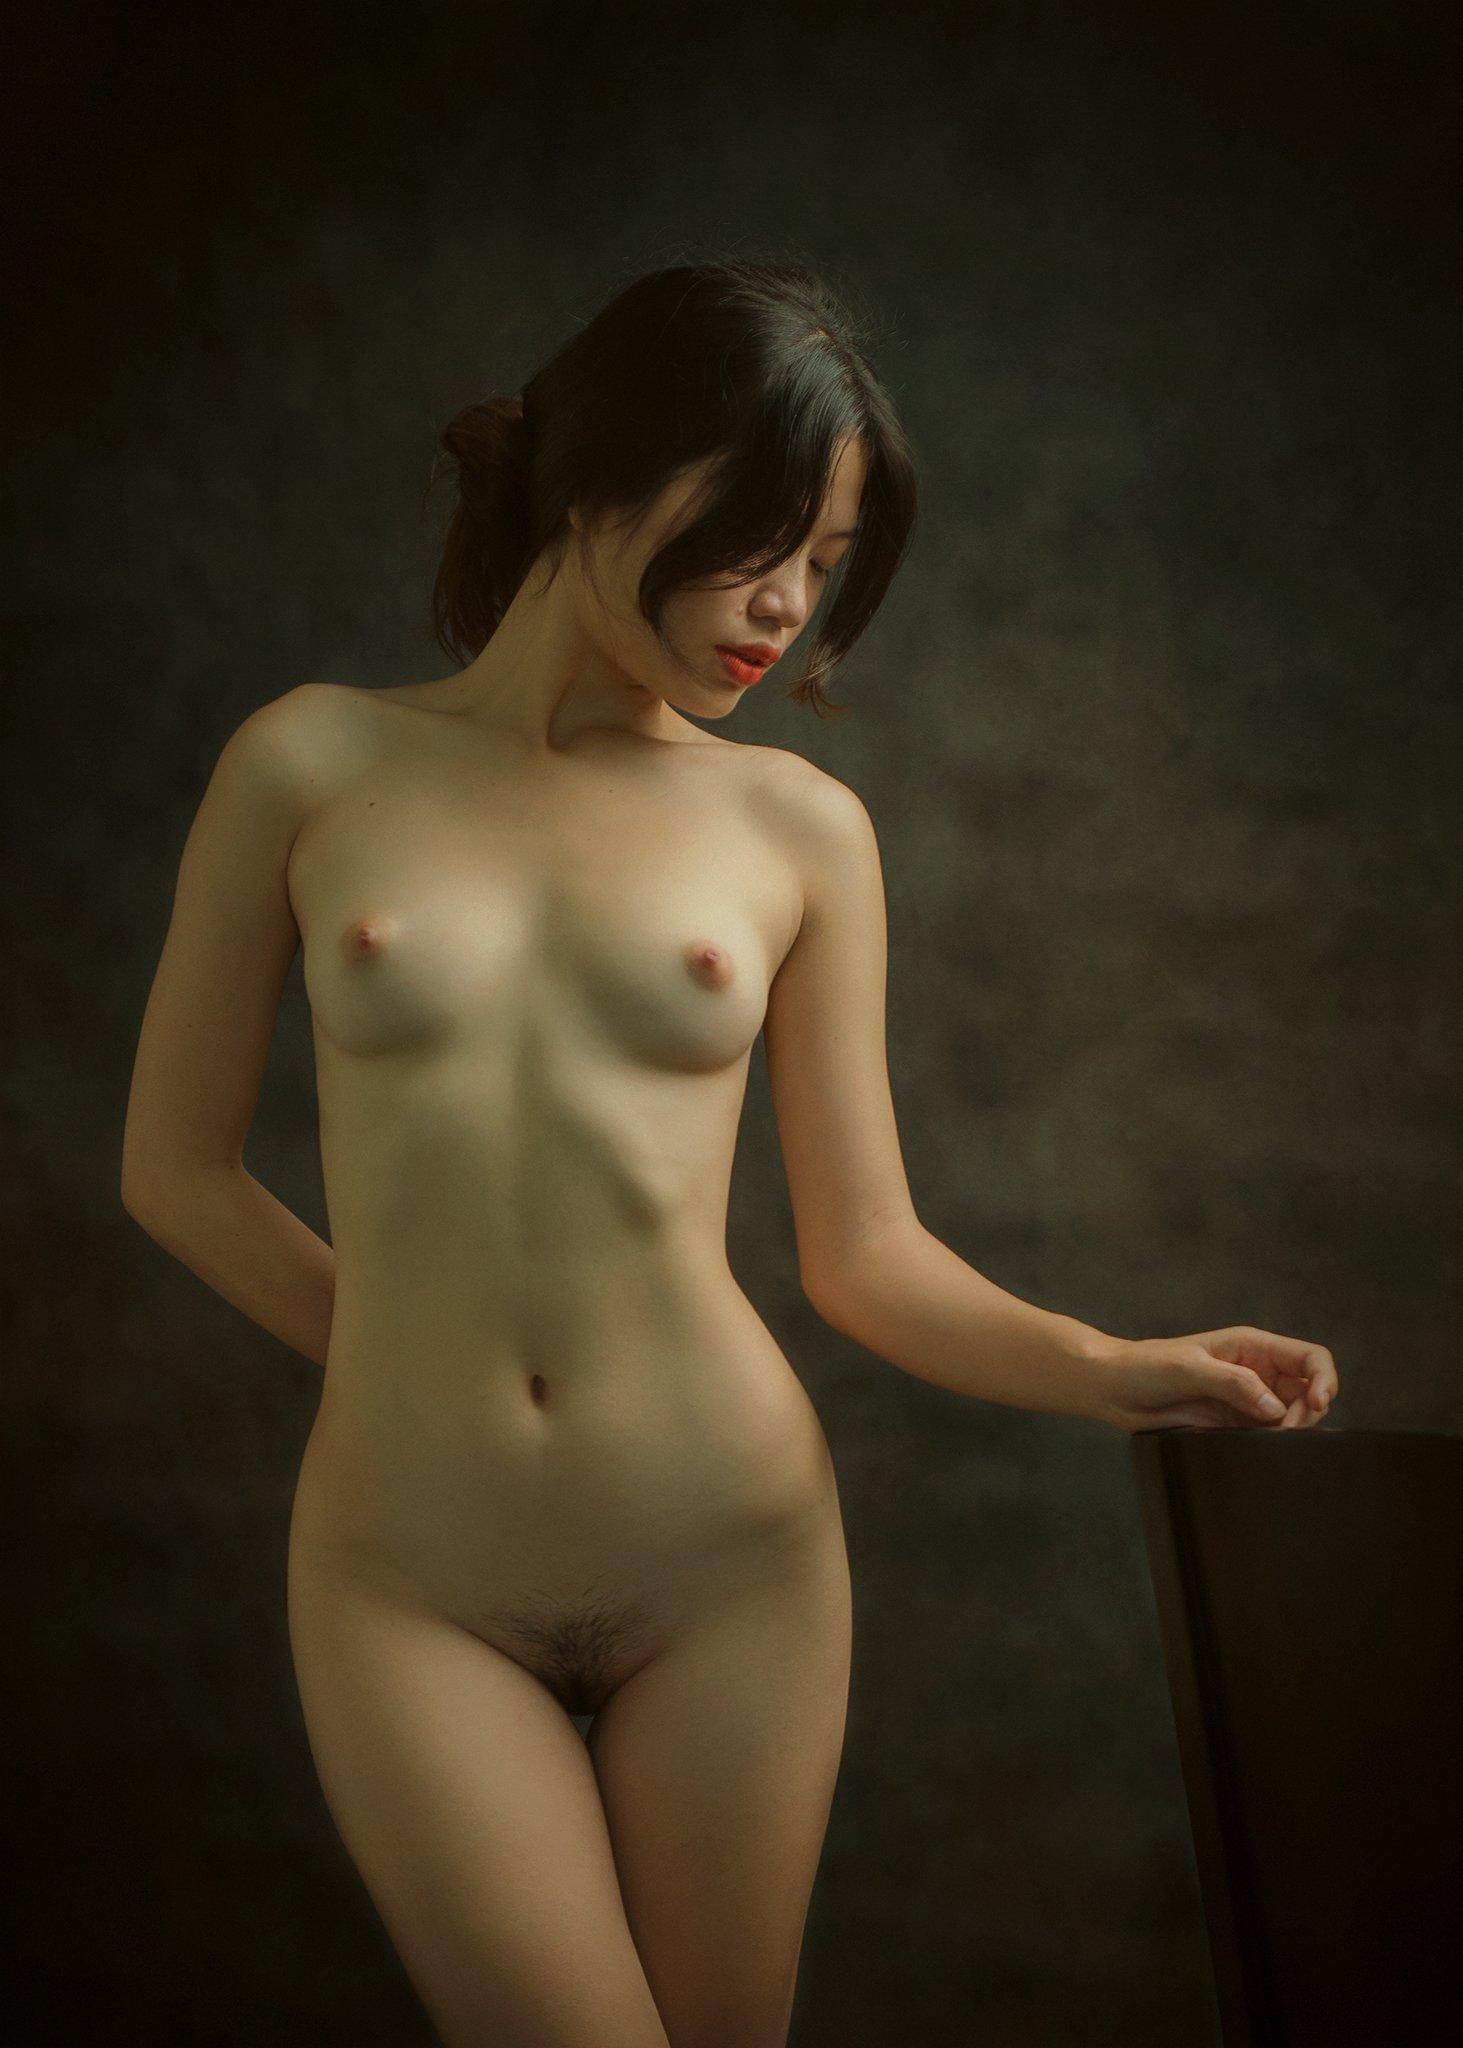 portrait, female, woman, girl, asian, vietnam, vietnamese, young, beauty, glamour, nude, fine nude, light, studio, mood, Hoang Viet Nguyen